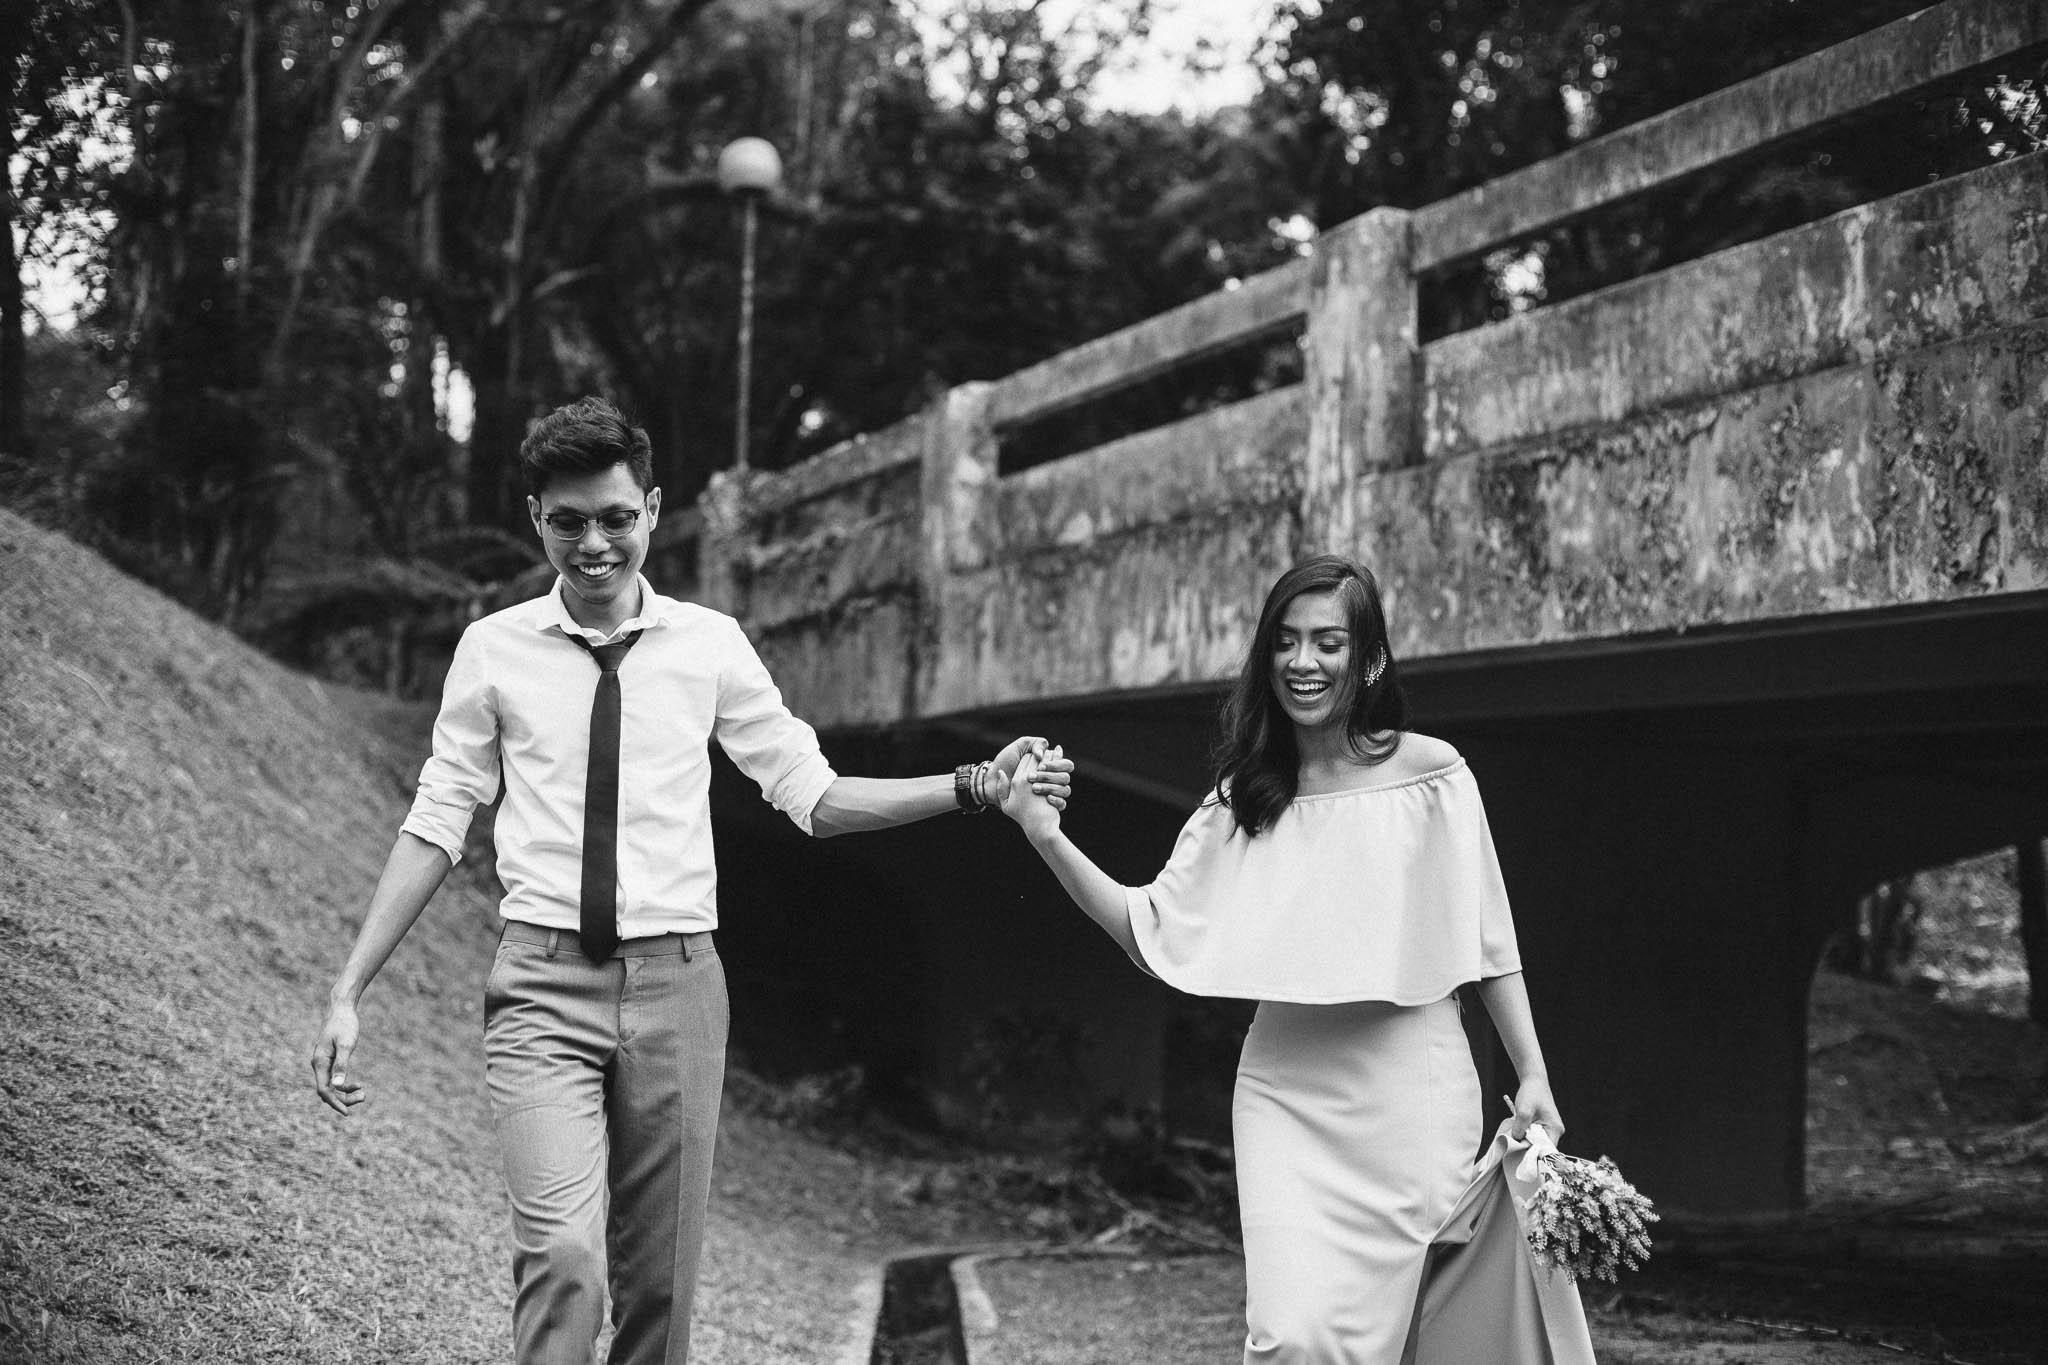 singapore-wedding-photographer-malay-travel-adli-tashah-07.jpg